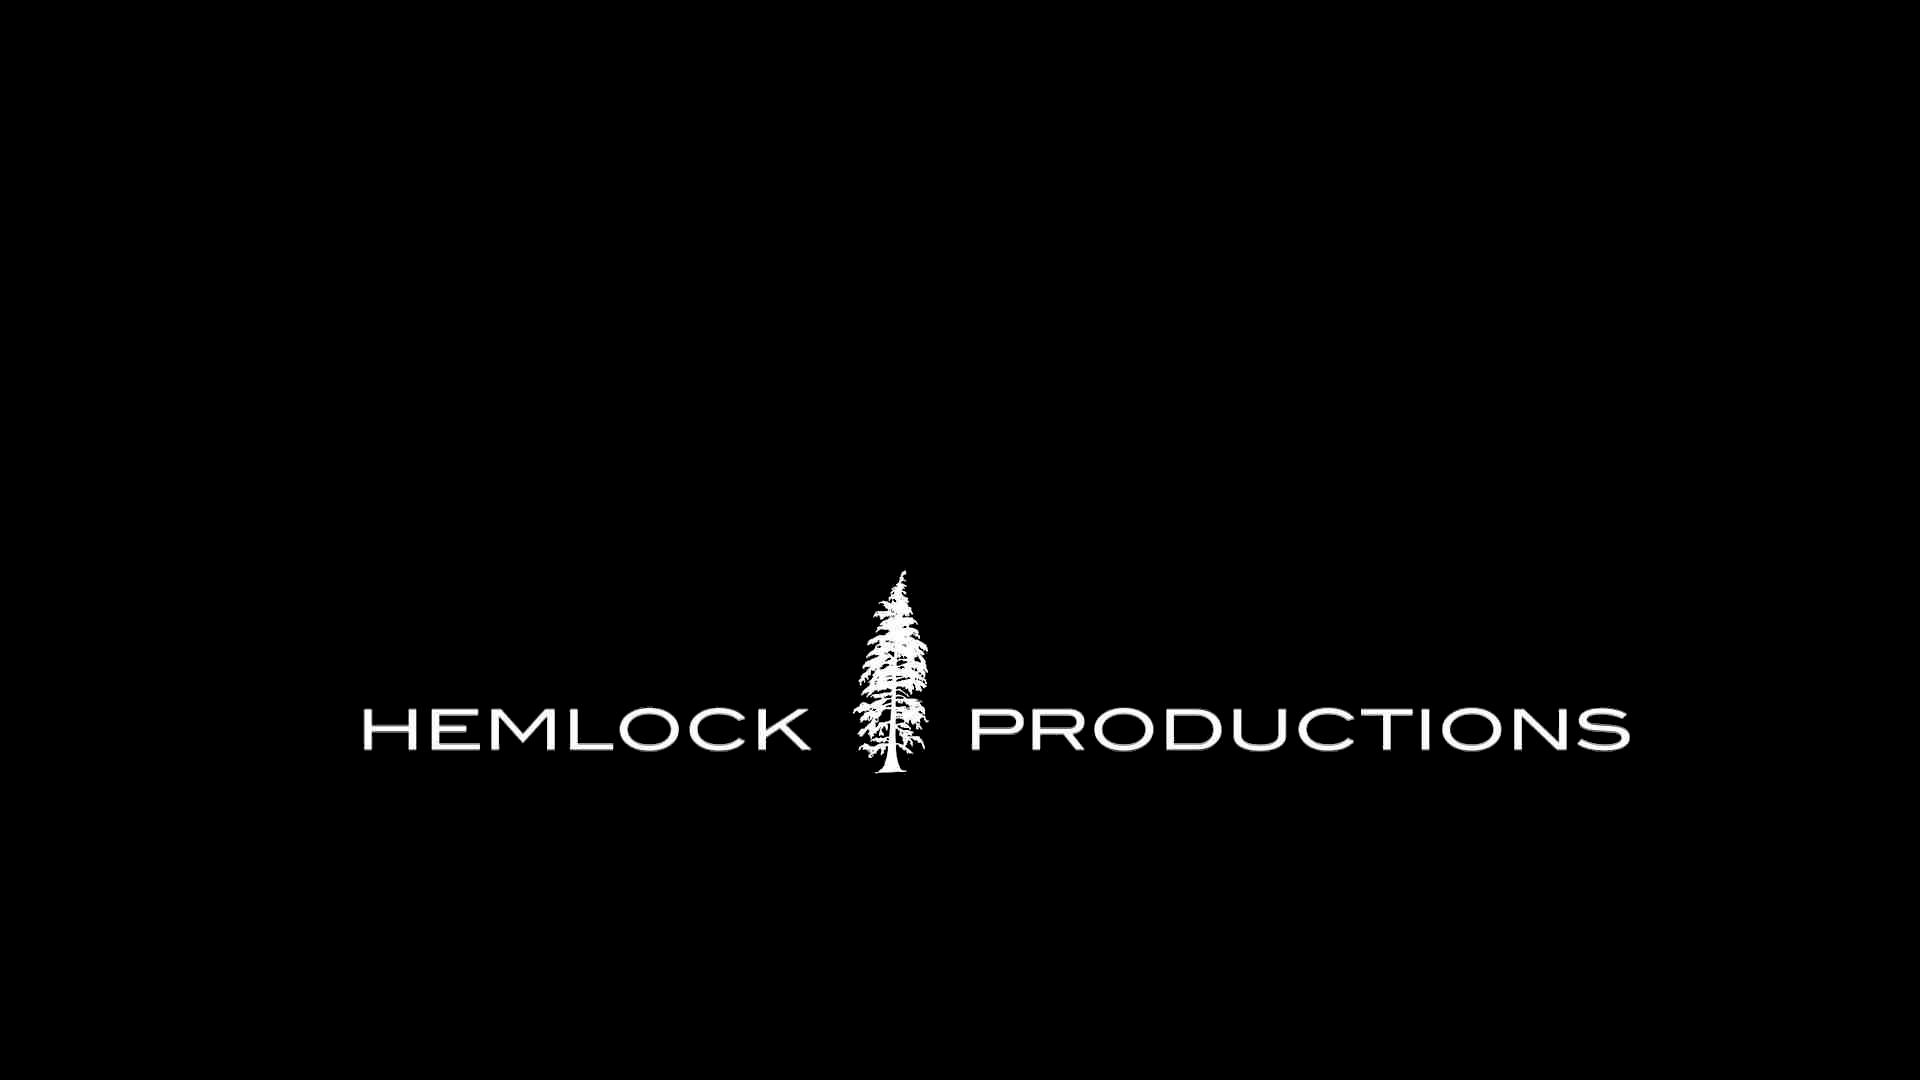 HemlockLogo_Transparent.png